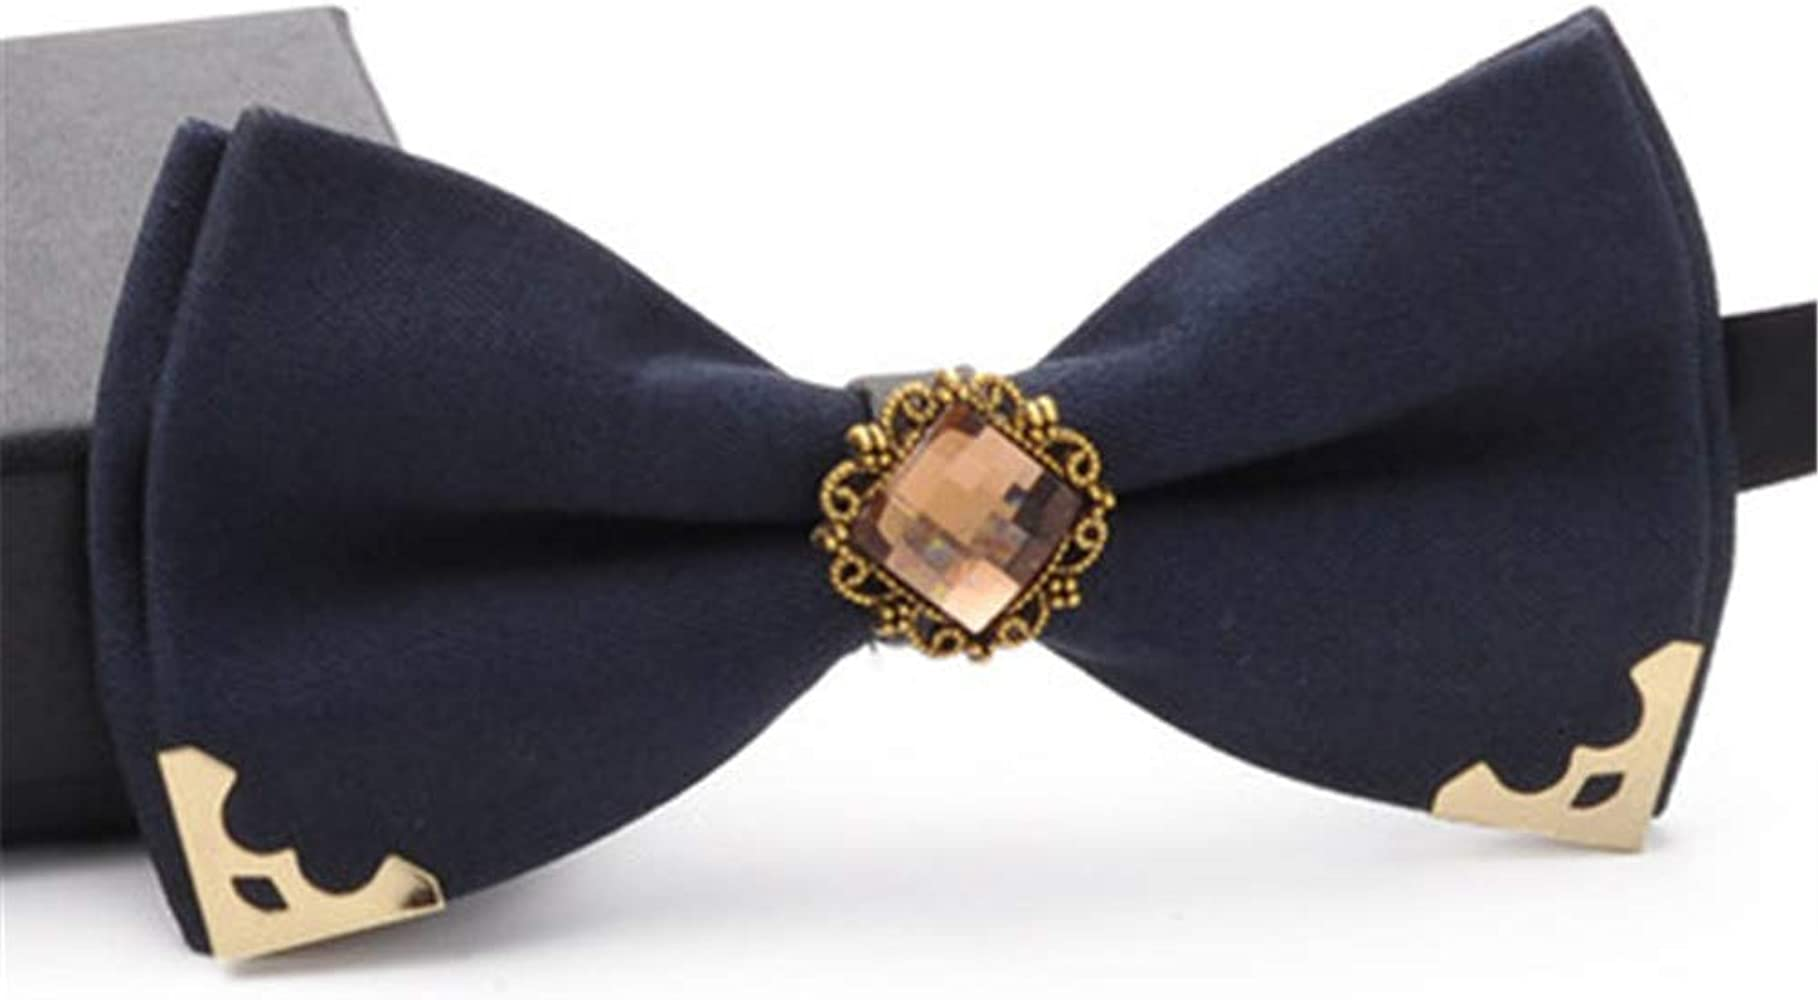 YYIILL Corbata de moño Hombres Pajarita Matrimonio Pajarita formal ...